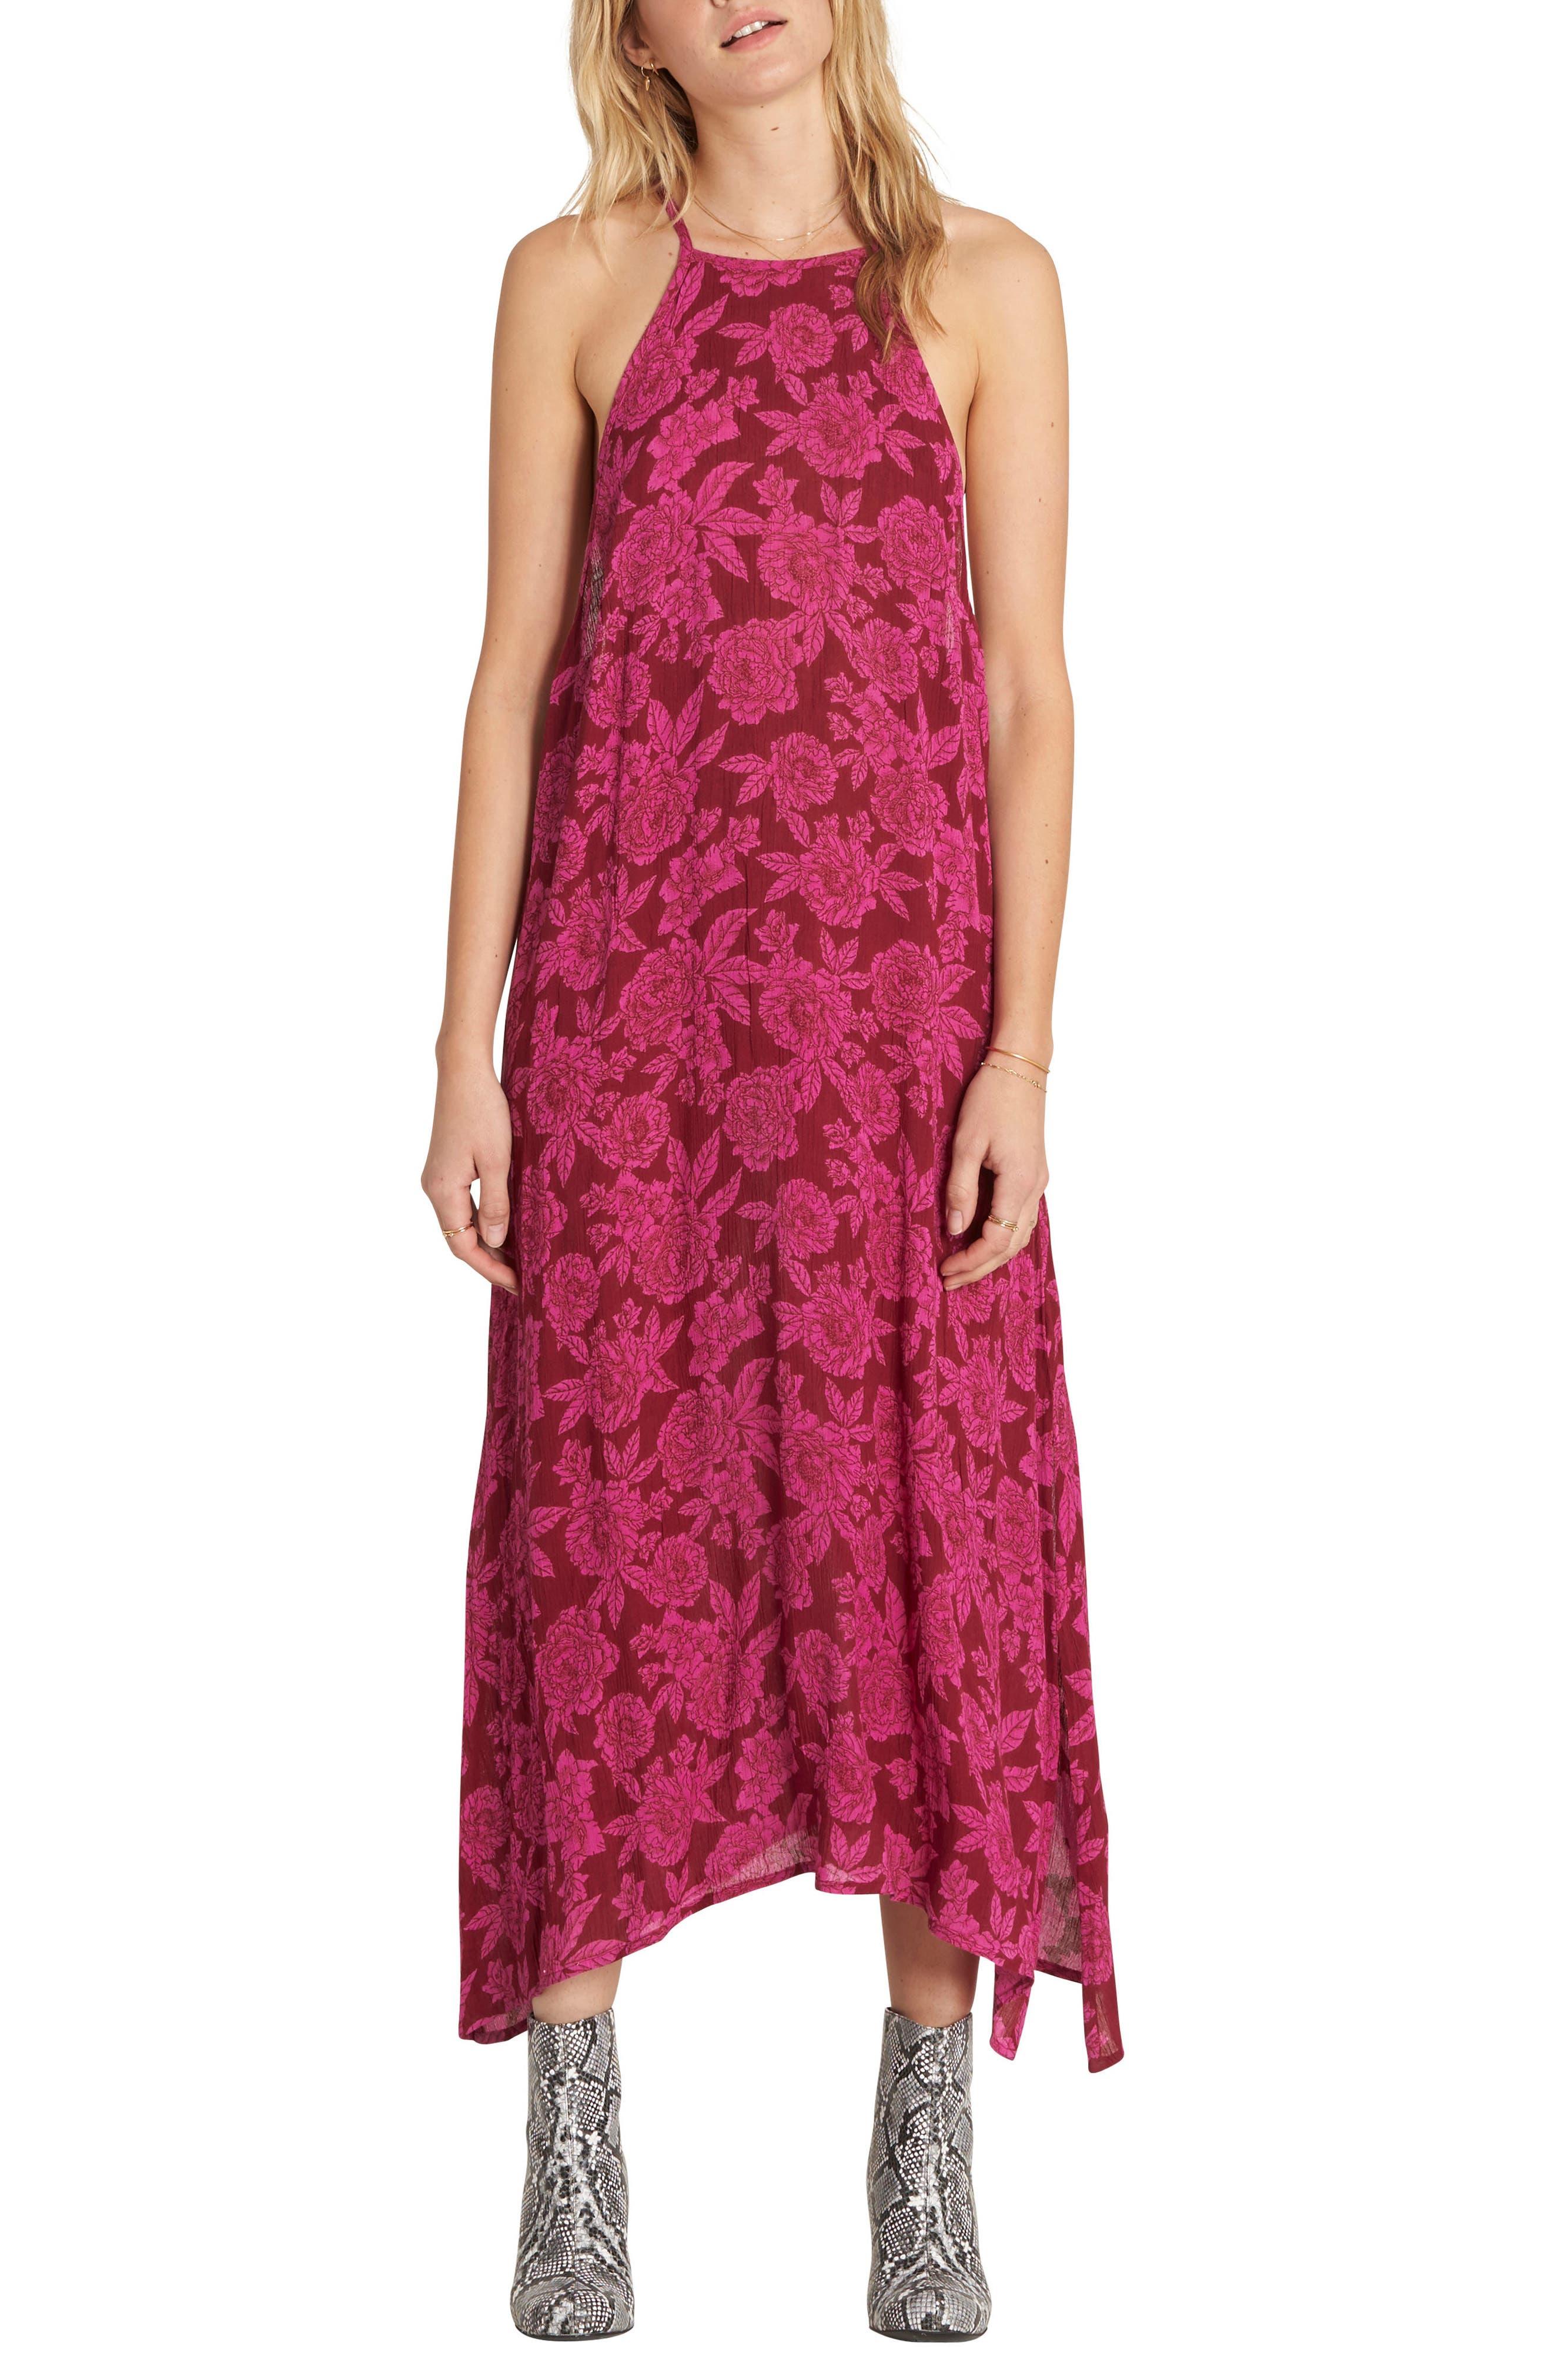 Dream to Dream Maxi Dress,                         Main,                         color, Pomegranate